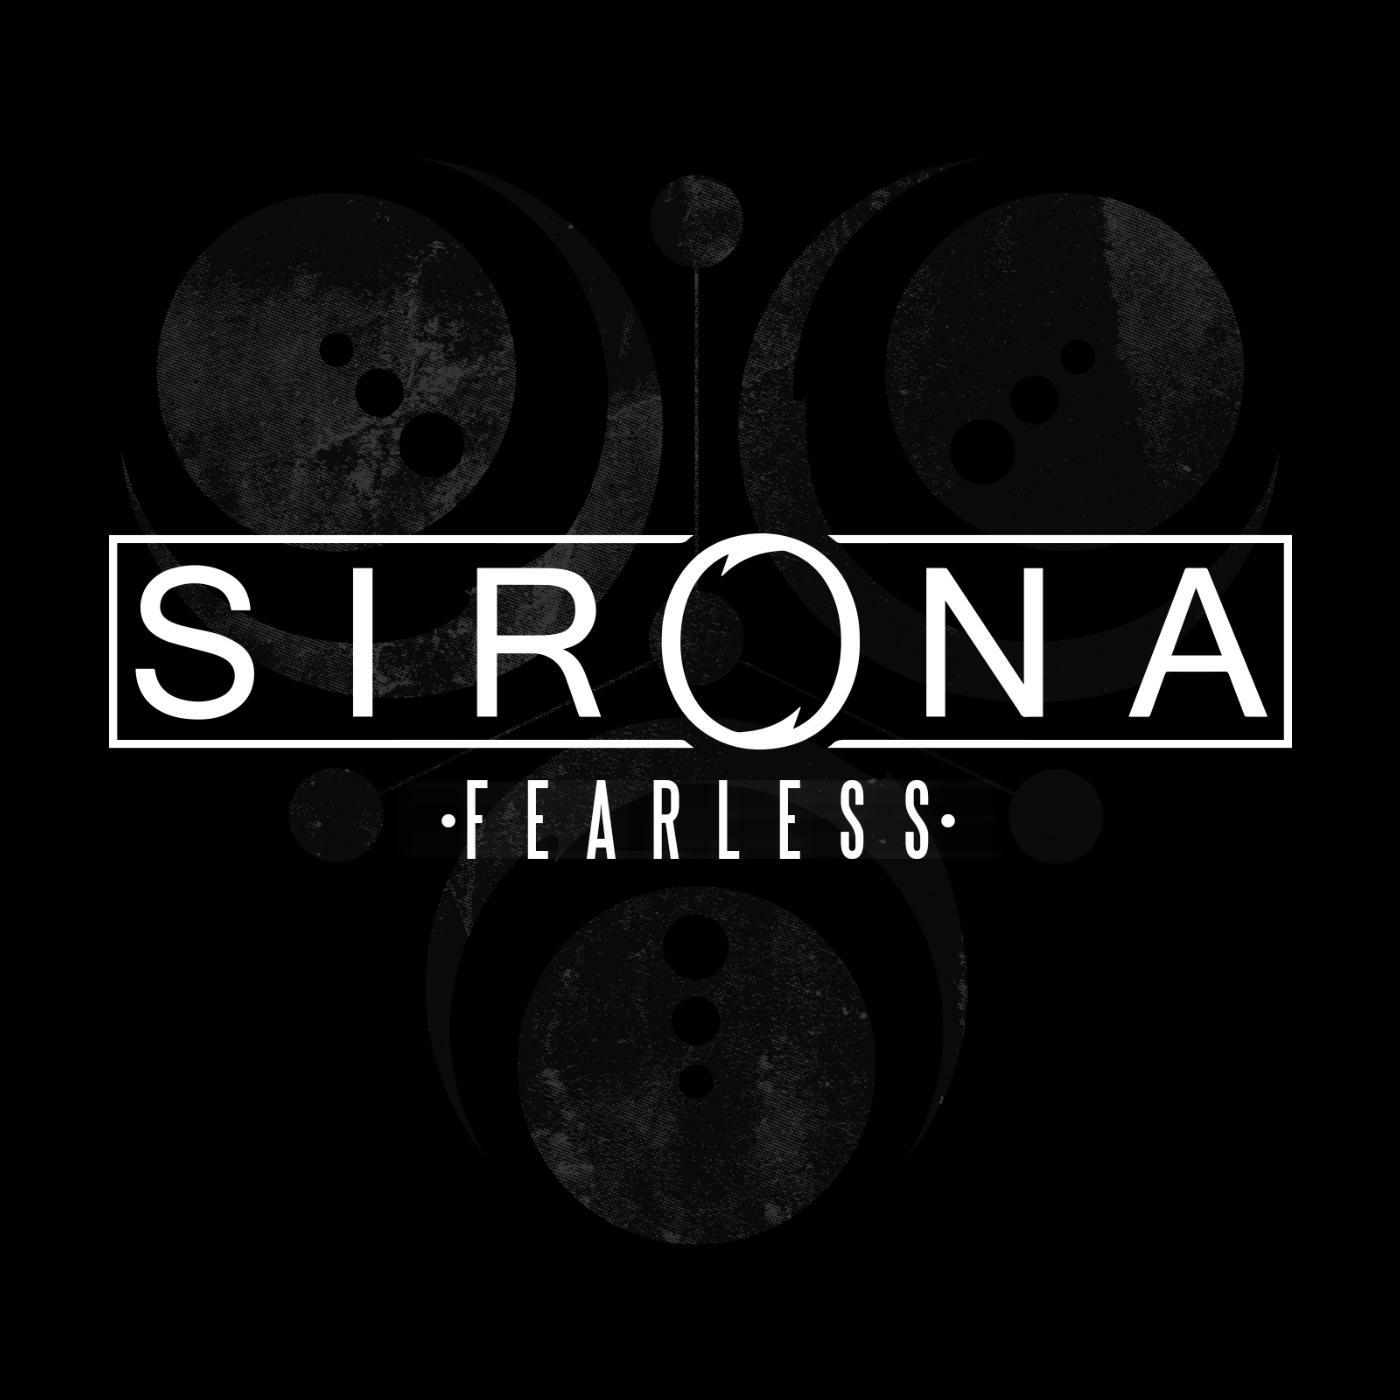 Sirona - Fearless [single] (2015)